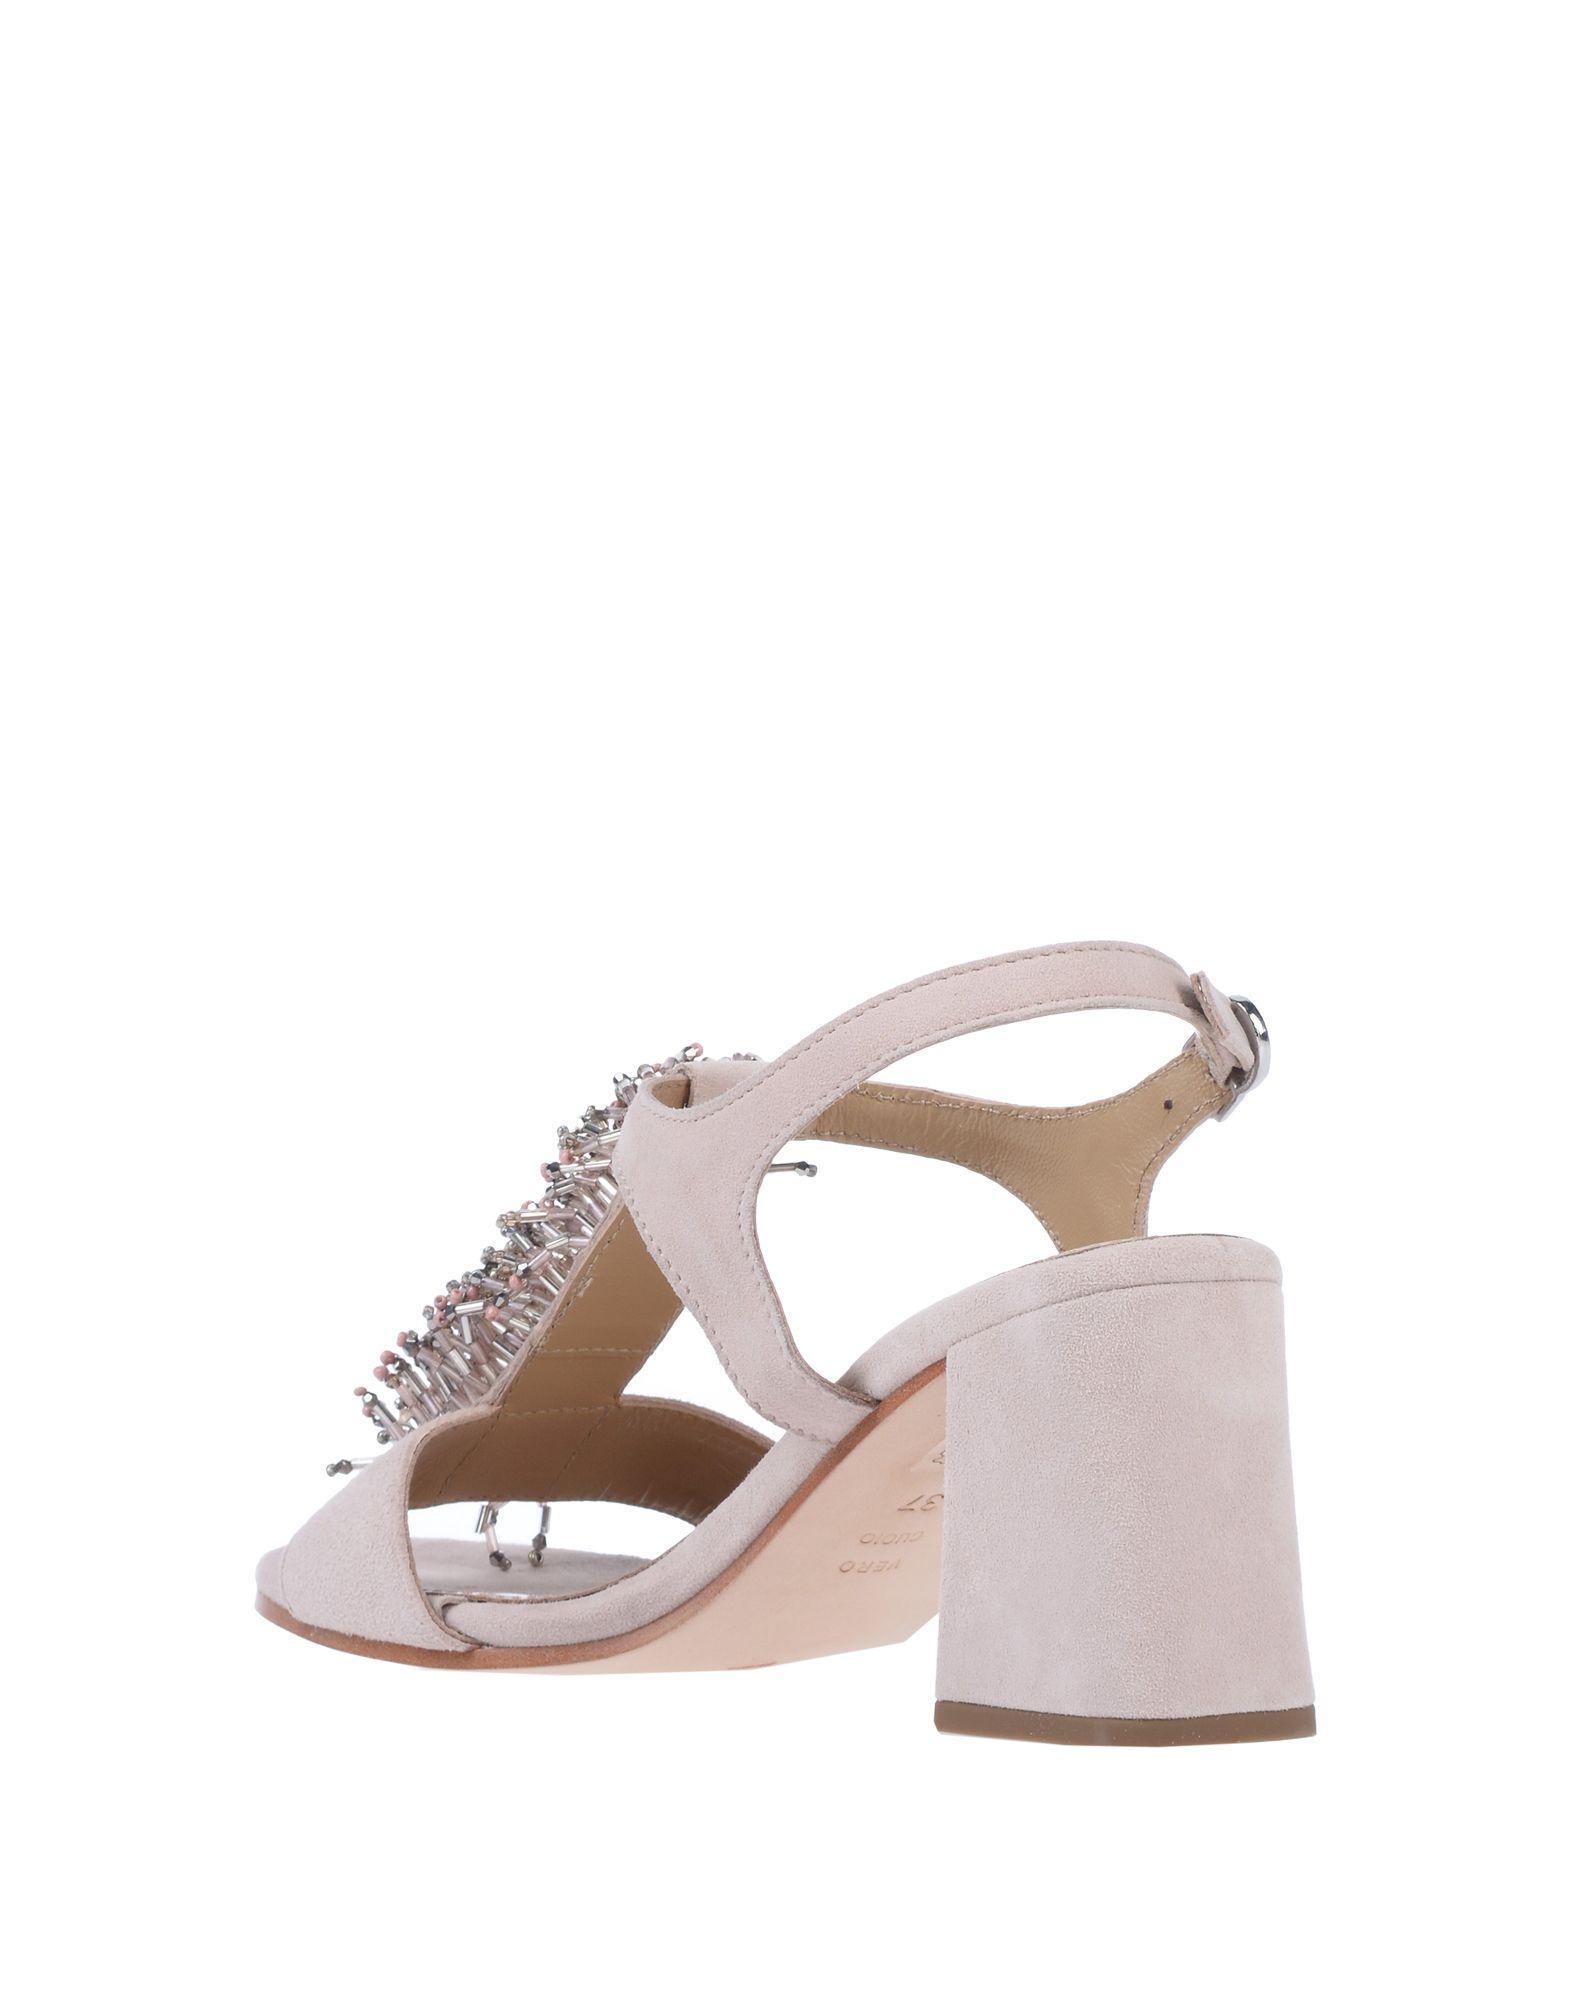 Sandals Apepazza Lyst Apepazza In In Pink Lyst Sandals OuTiPZkX